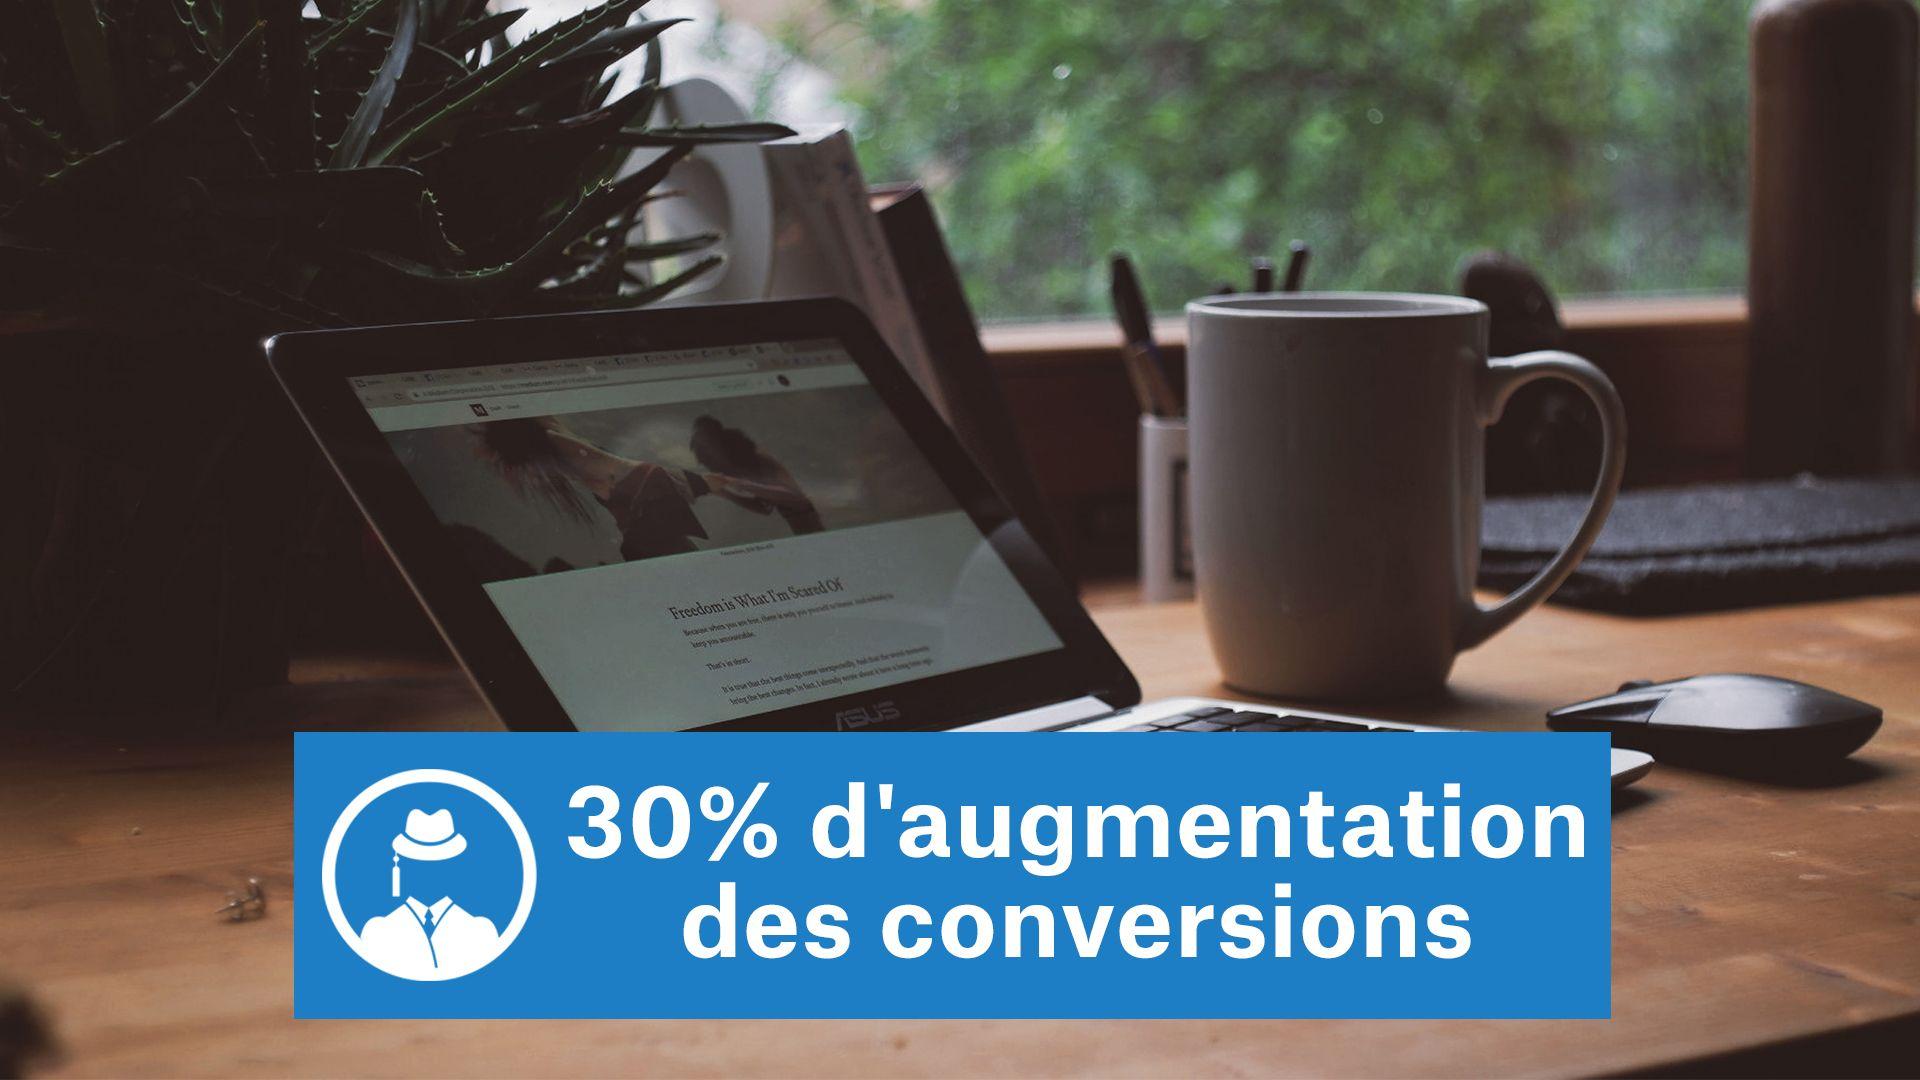 30% d'augmentation des conversions [une petite modification] #GrowthHacking #WebMarketing #FormationGrowthHacking #CentreDeFormationFrance #TunnelAARRR #AARRR #SocialMedia #CommunityManagement #SEO #MarketingDigital #SiteWeb #copywriting